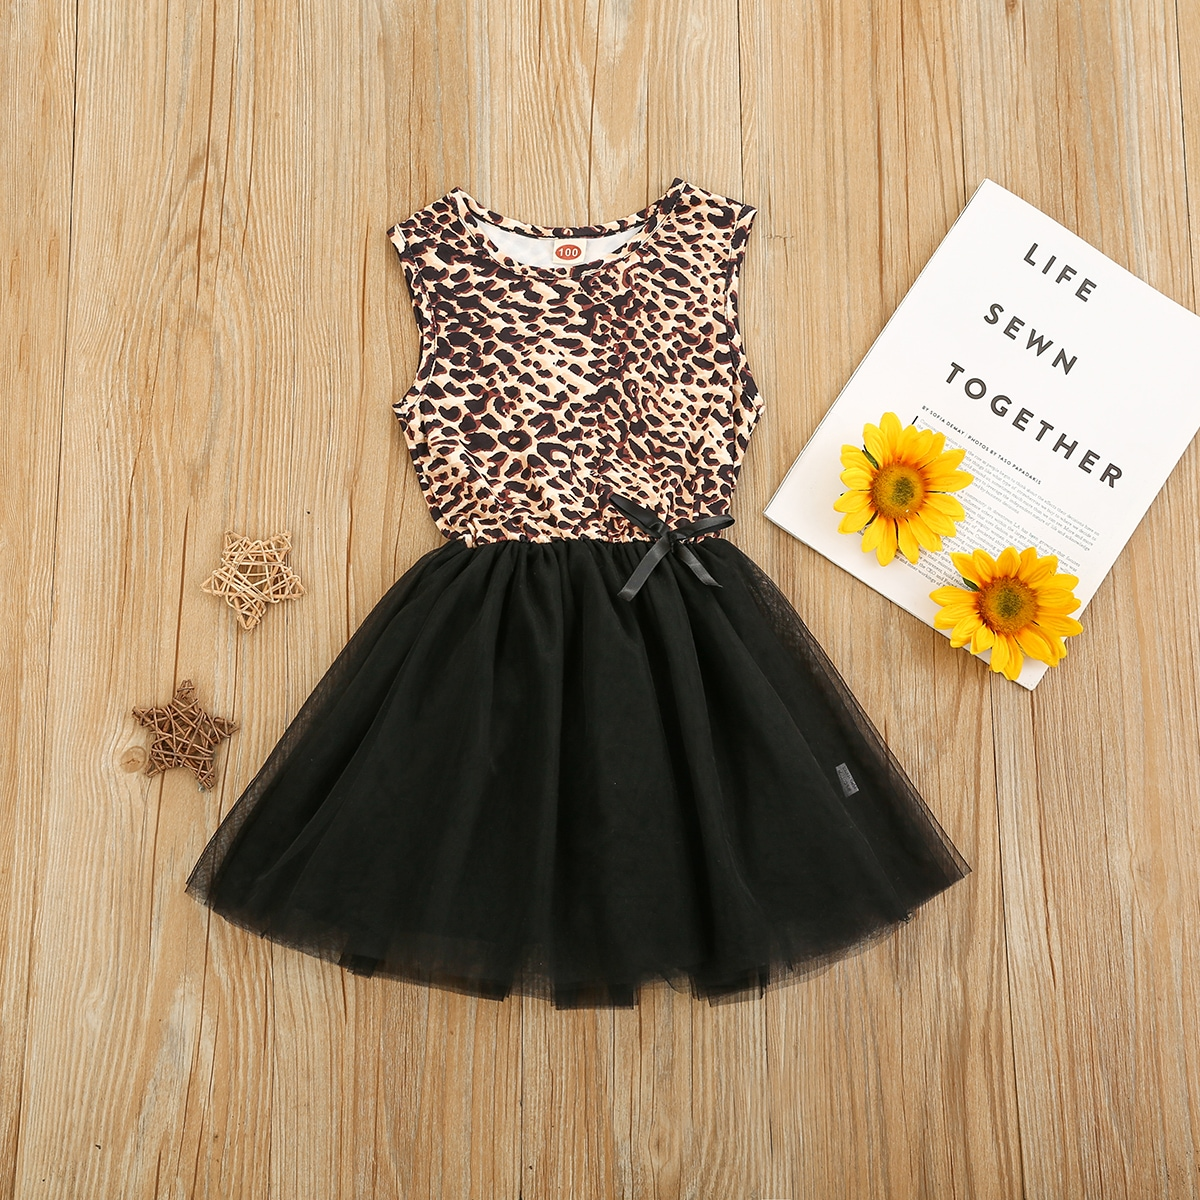 Toddler Girls Leopard Spliced Tutu Dress, SHEIN  - buy with discount